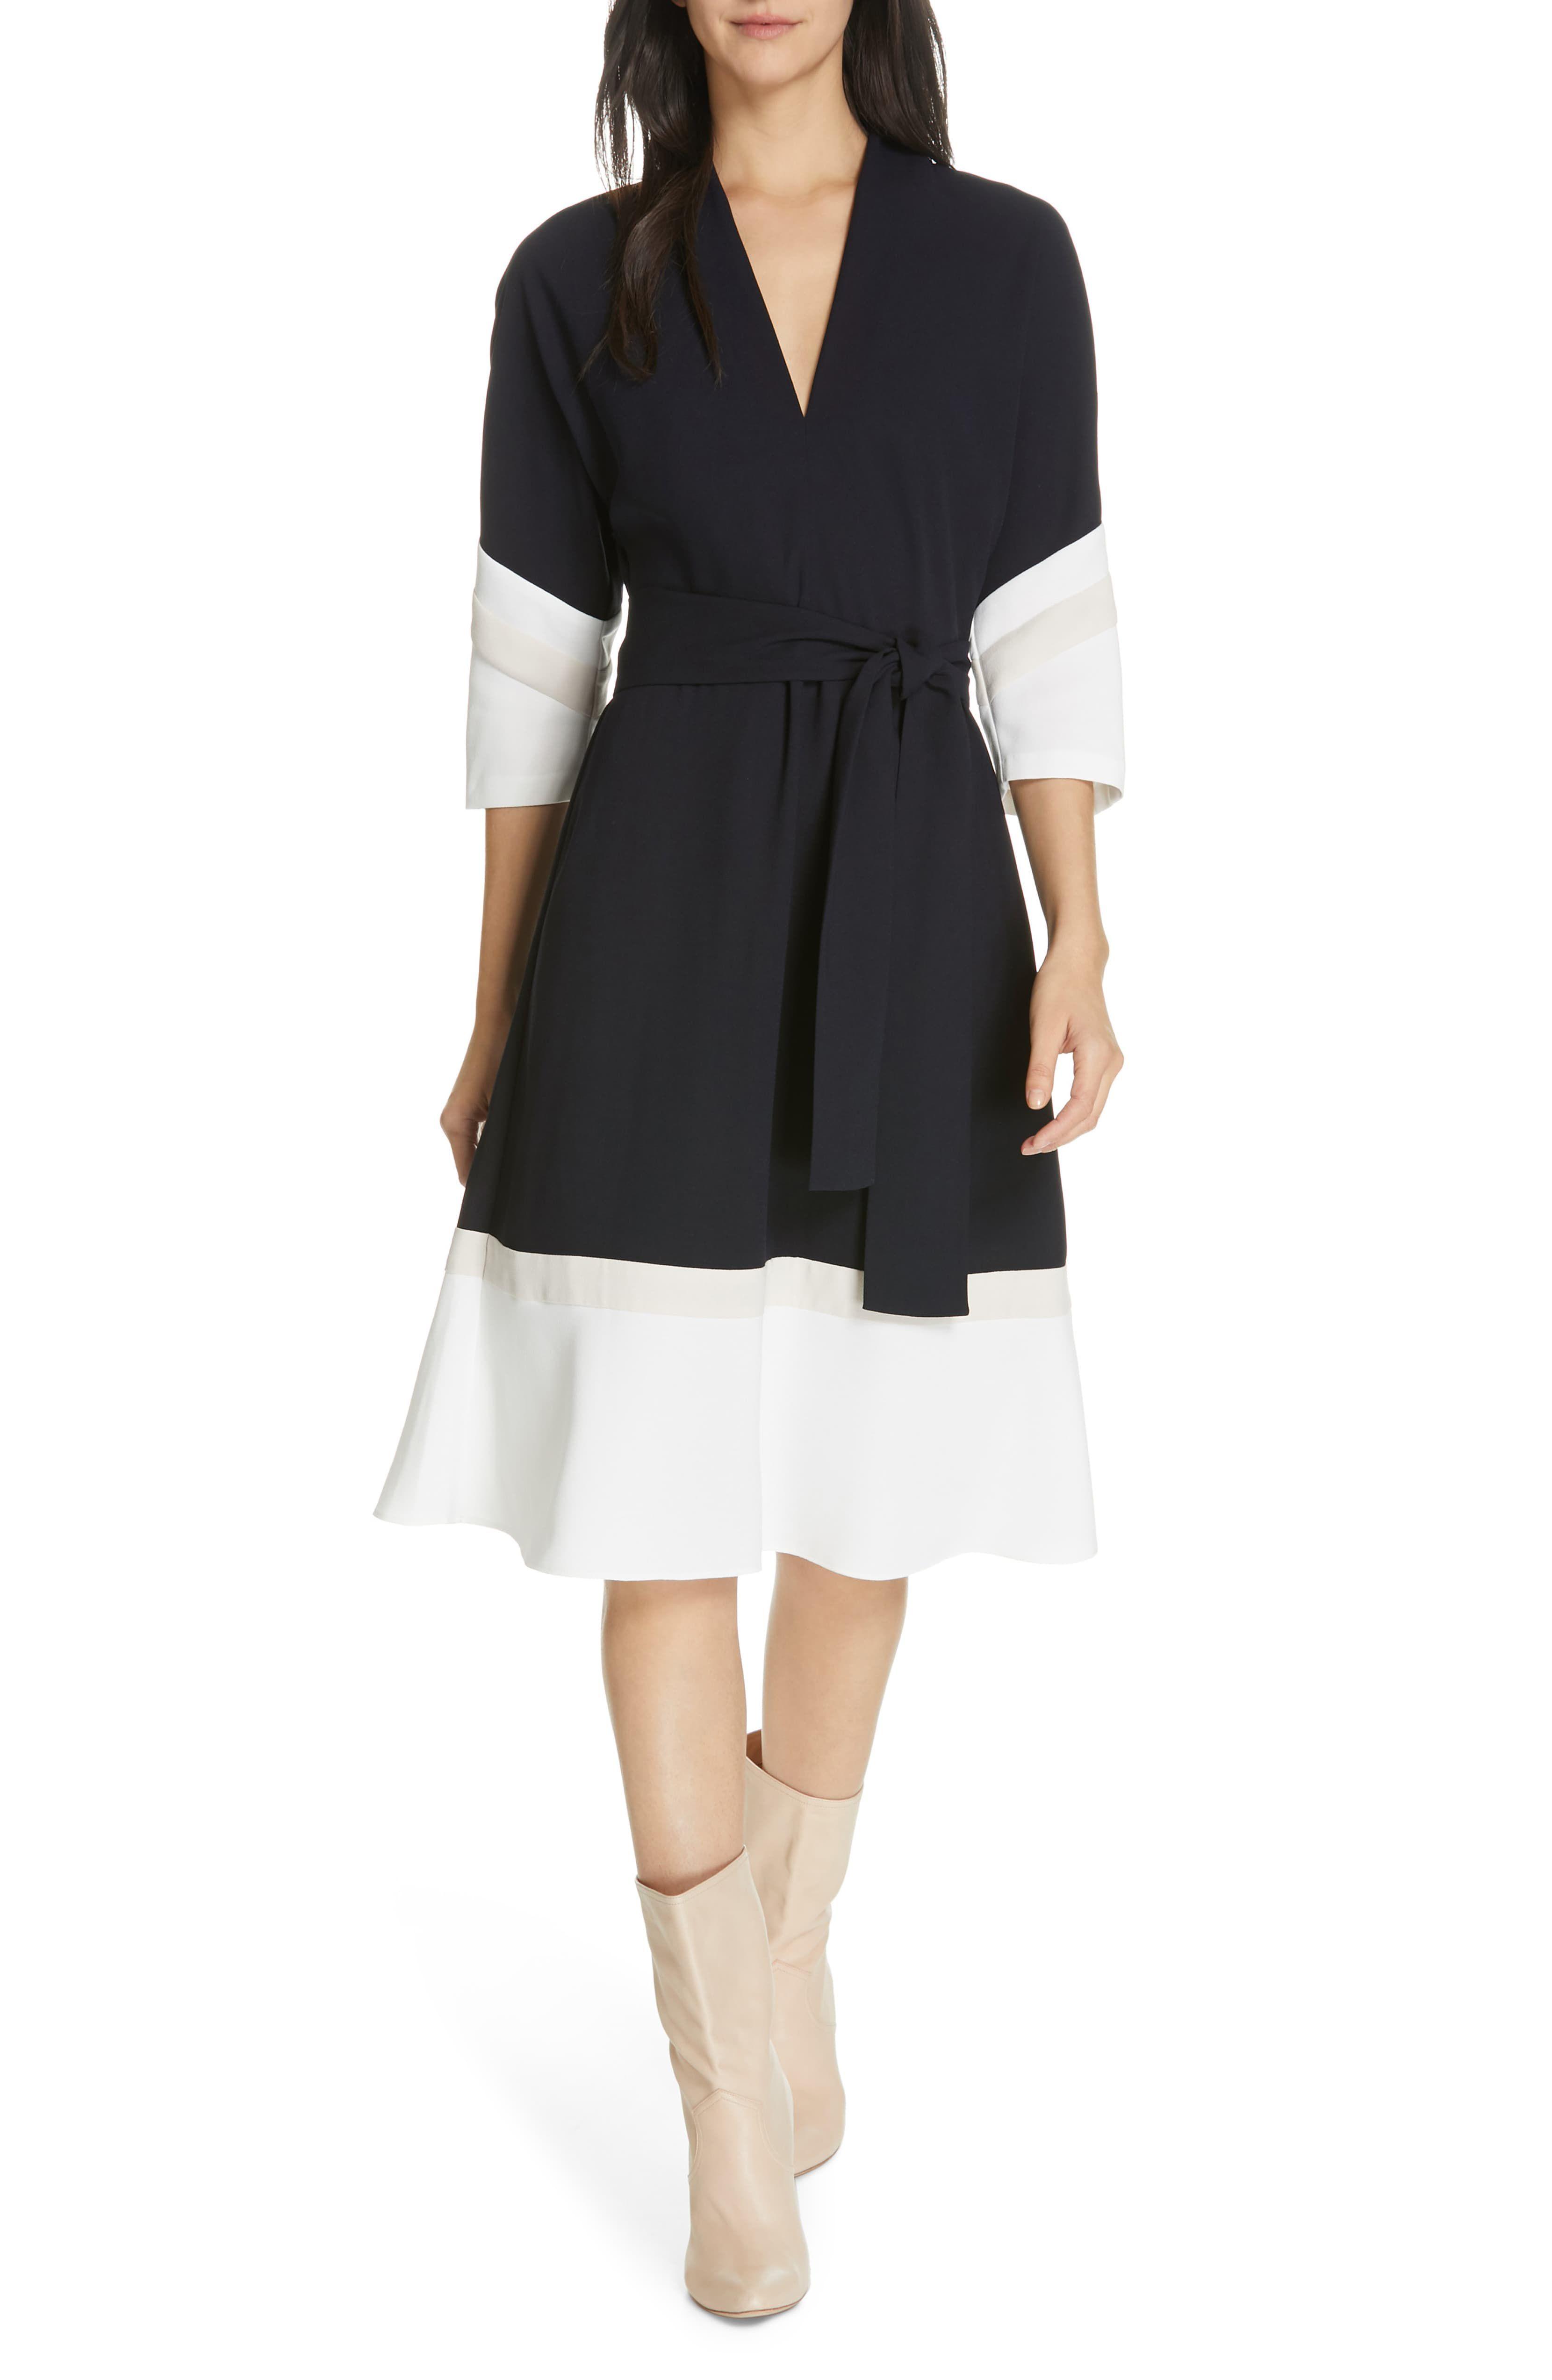 Joie   Aydrien Colorblock Dress   Multi   8